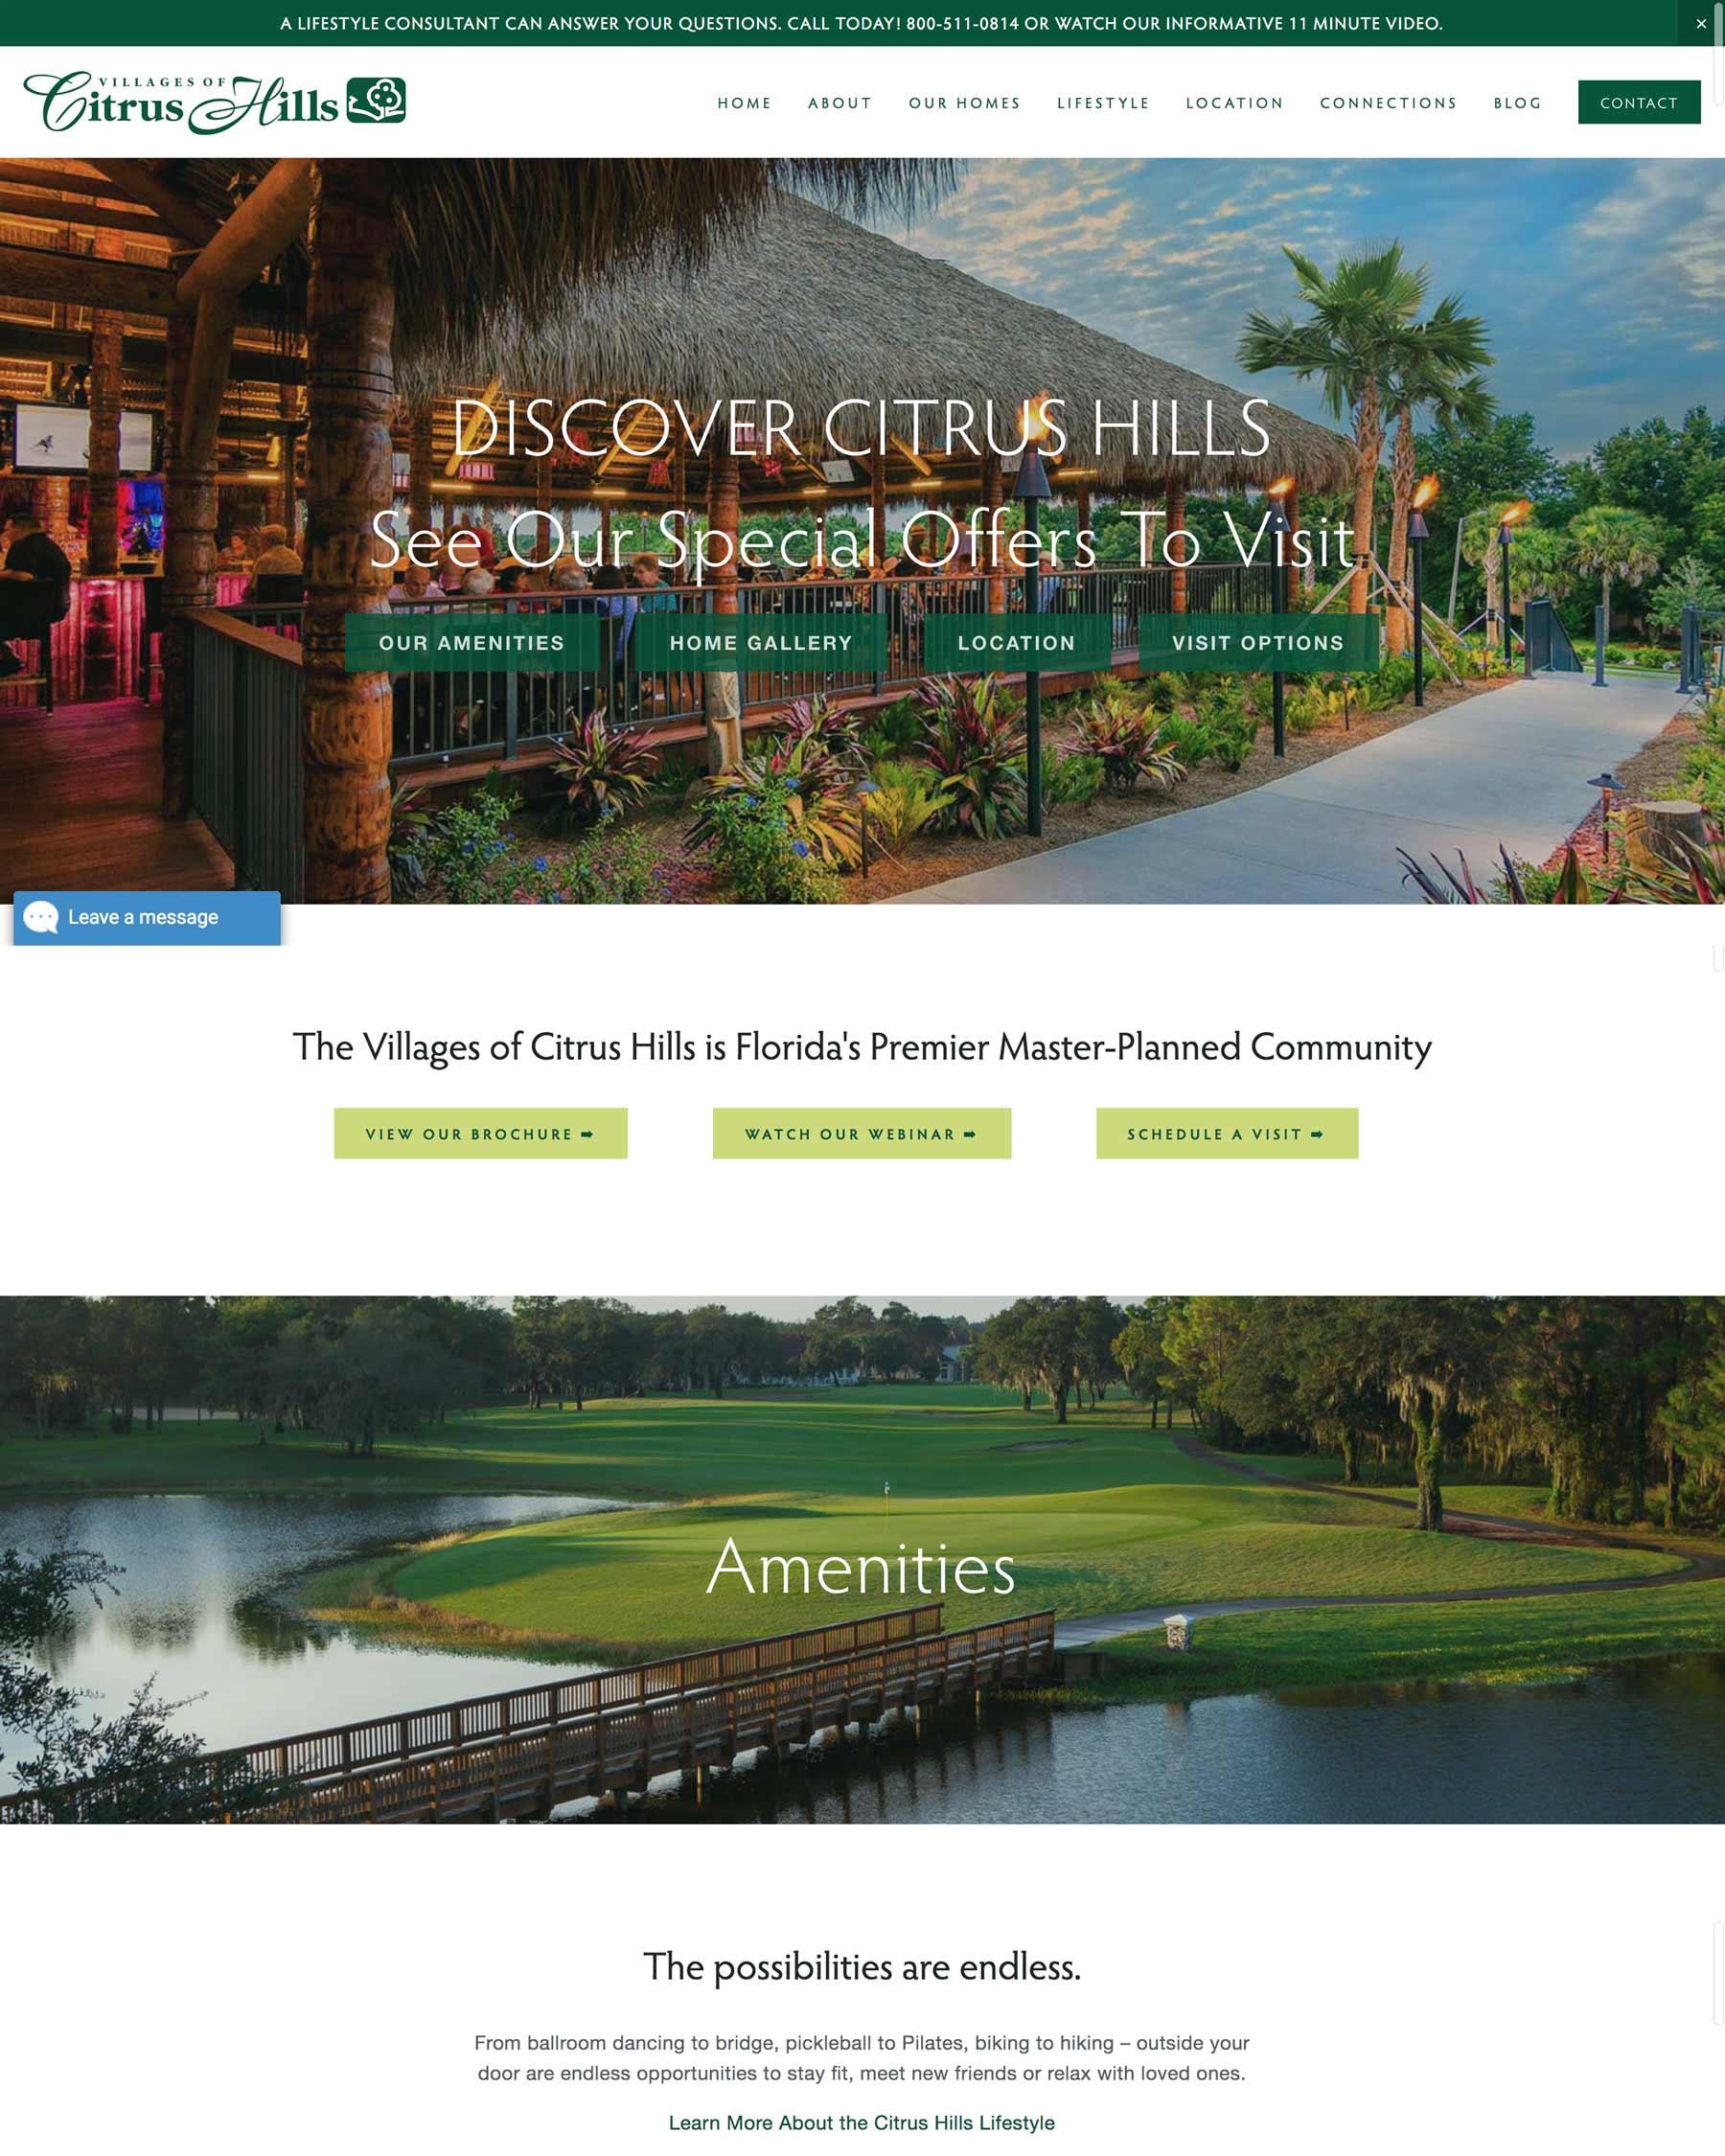 The Villages of Citrus Hills - Retirement Community Home Builder, Developer and Planned Community